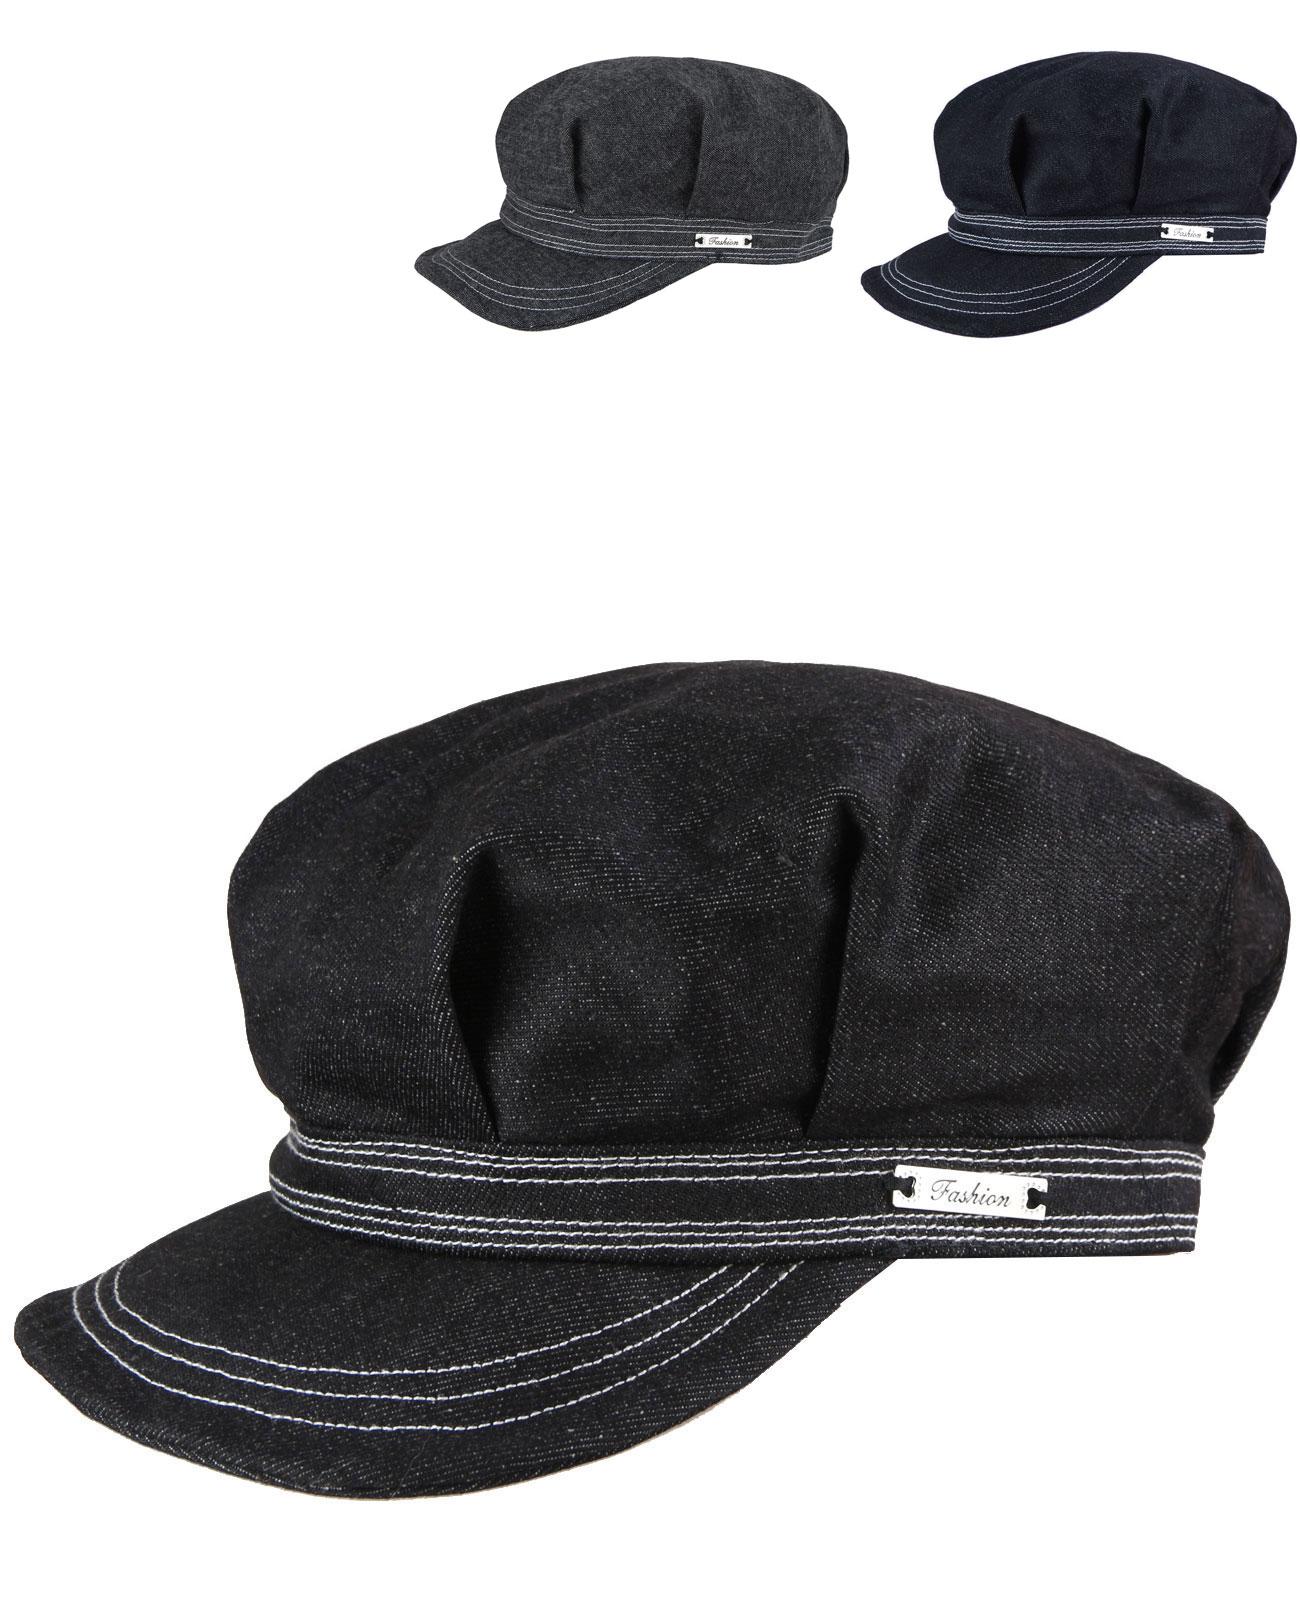 b8d4d2276dd9b3 caripe Damen Ballonmütze Schirmmütze Sommer Mütze Vintage Cap Jeans - fash18